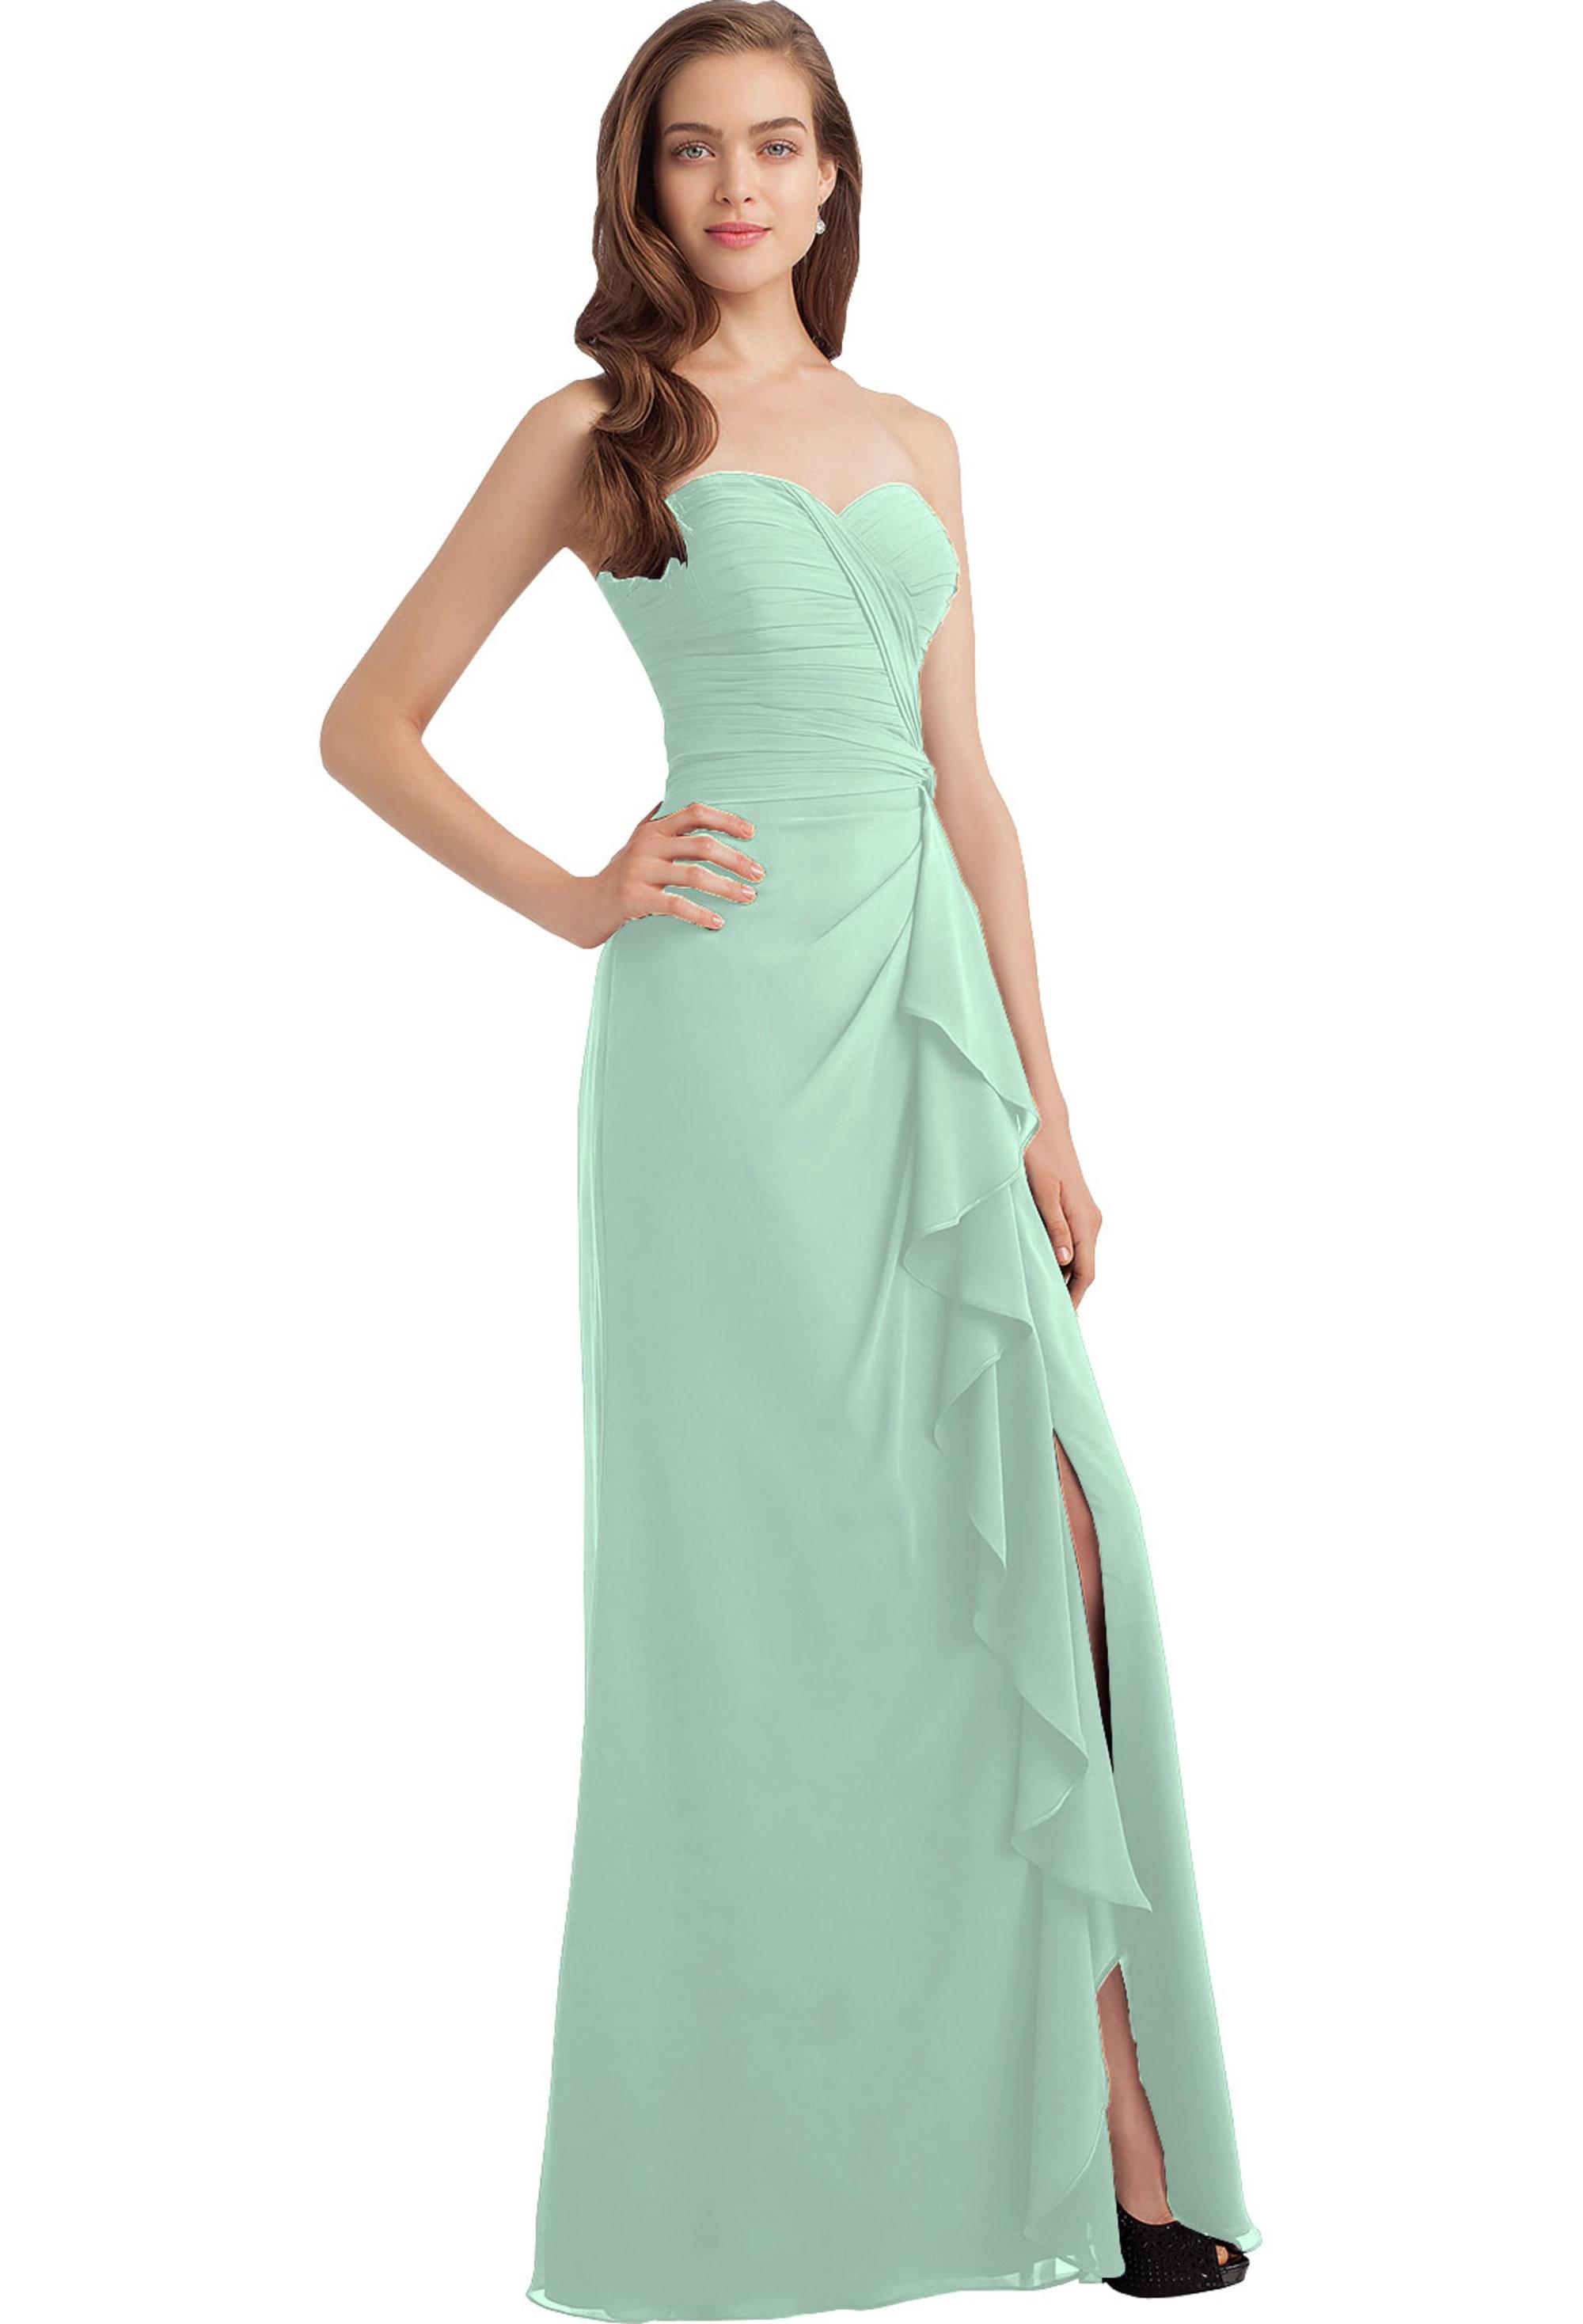 Bill Levkoff MINT Chiffon Sweetheart A-line gown, $230.00 Front